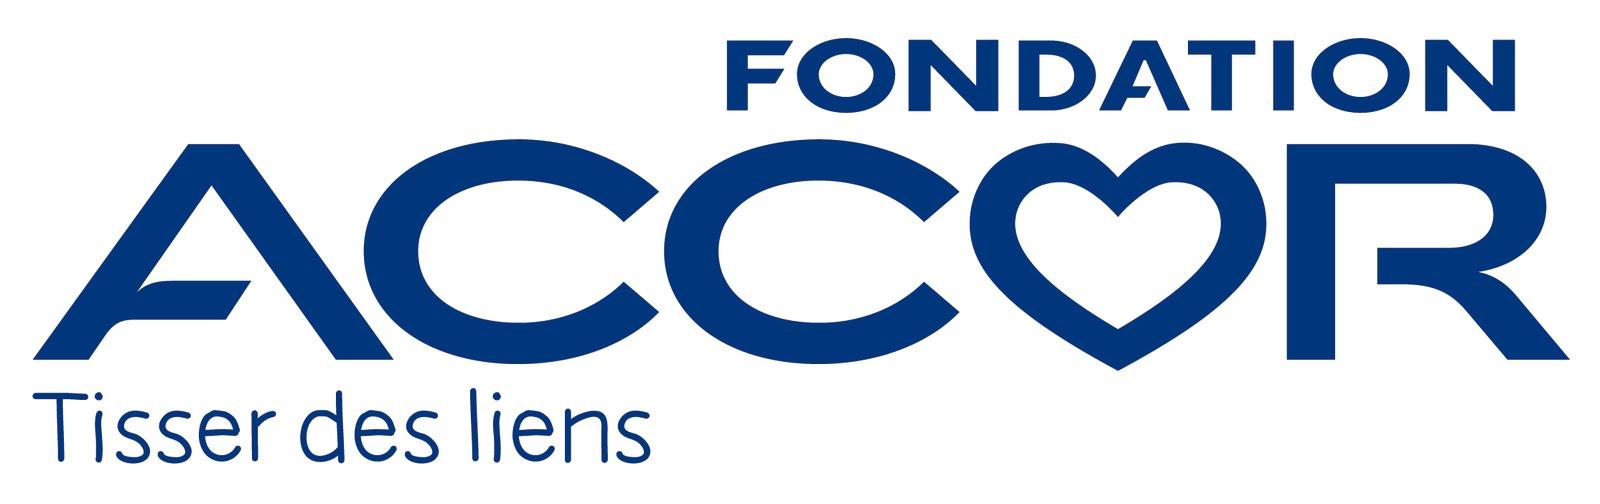 accor-logo-fondation